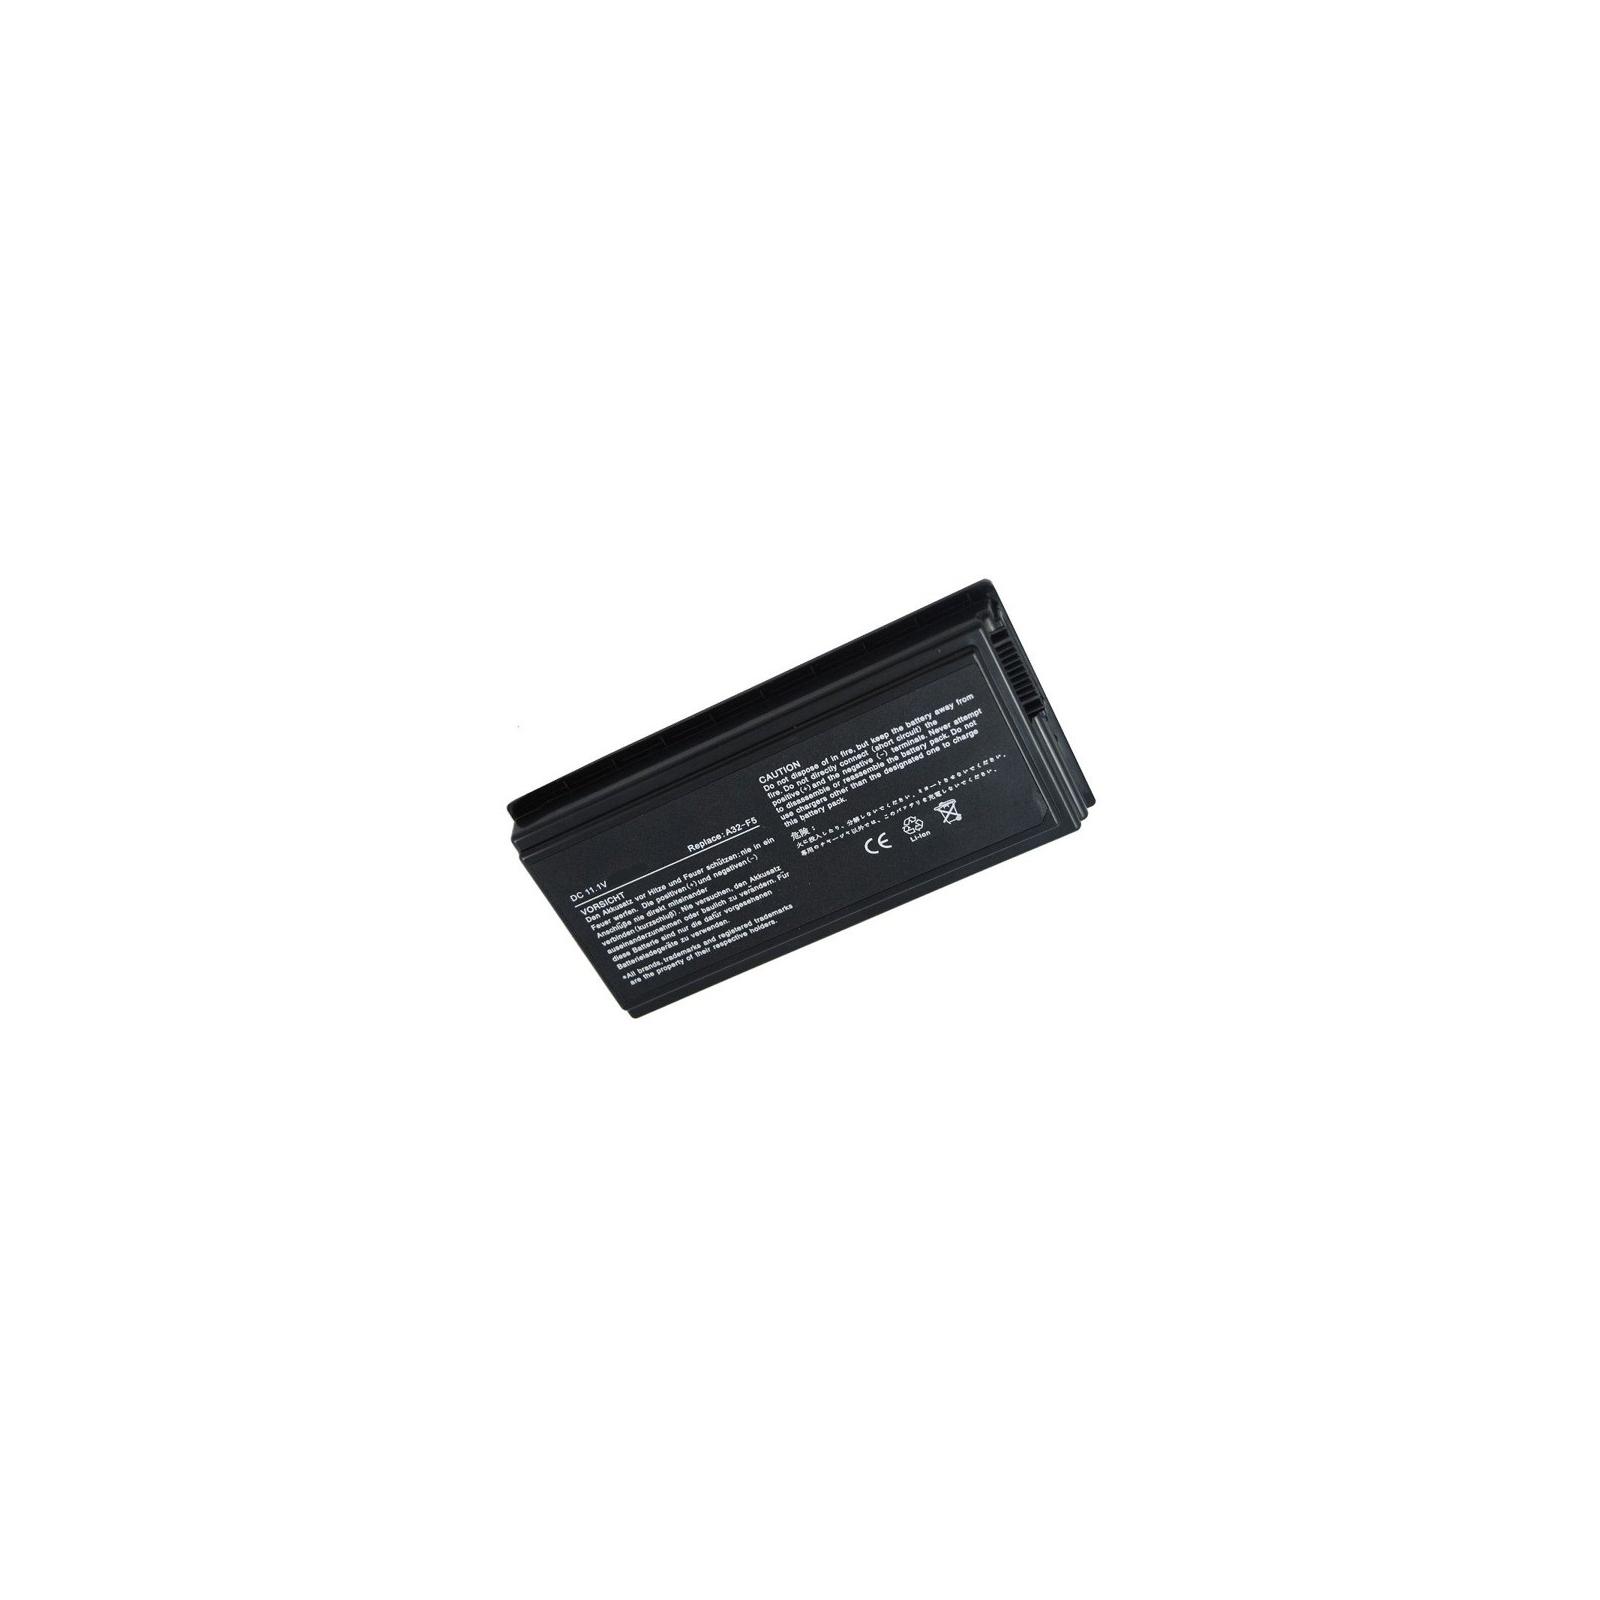 Аккумулятор для ноутбука ASUS F5 (A32-F5, AS5010LH) 11.1V 5200mAh PowerPlant (NB00000015)